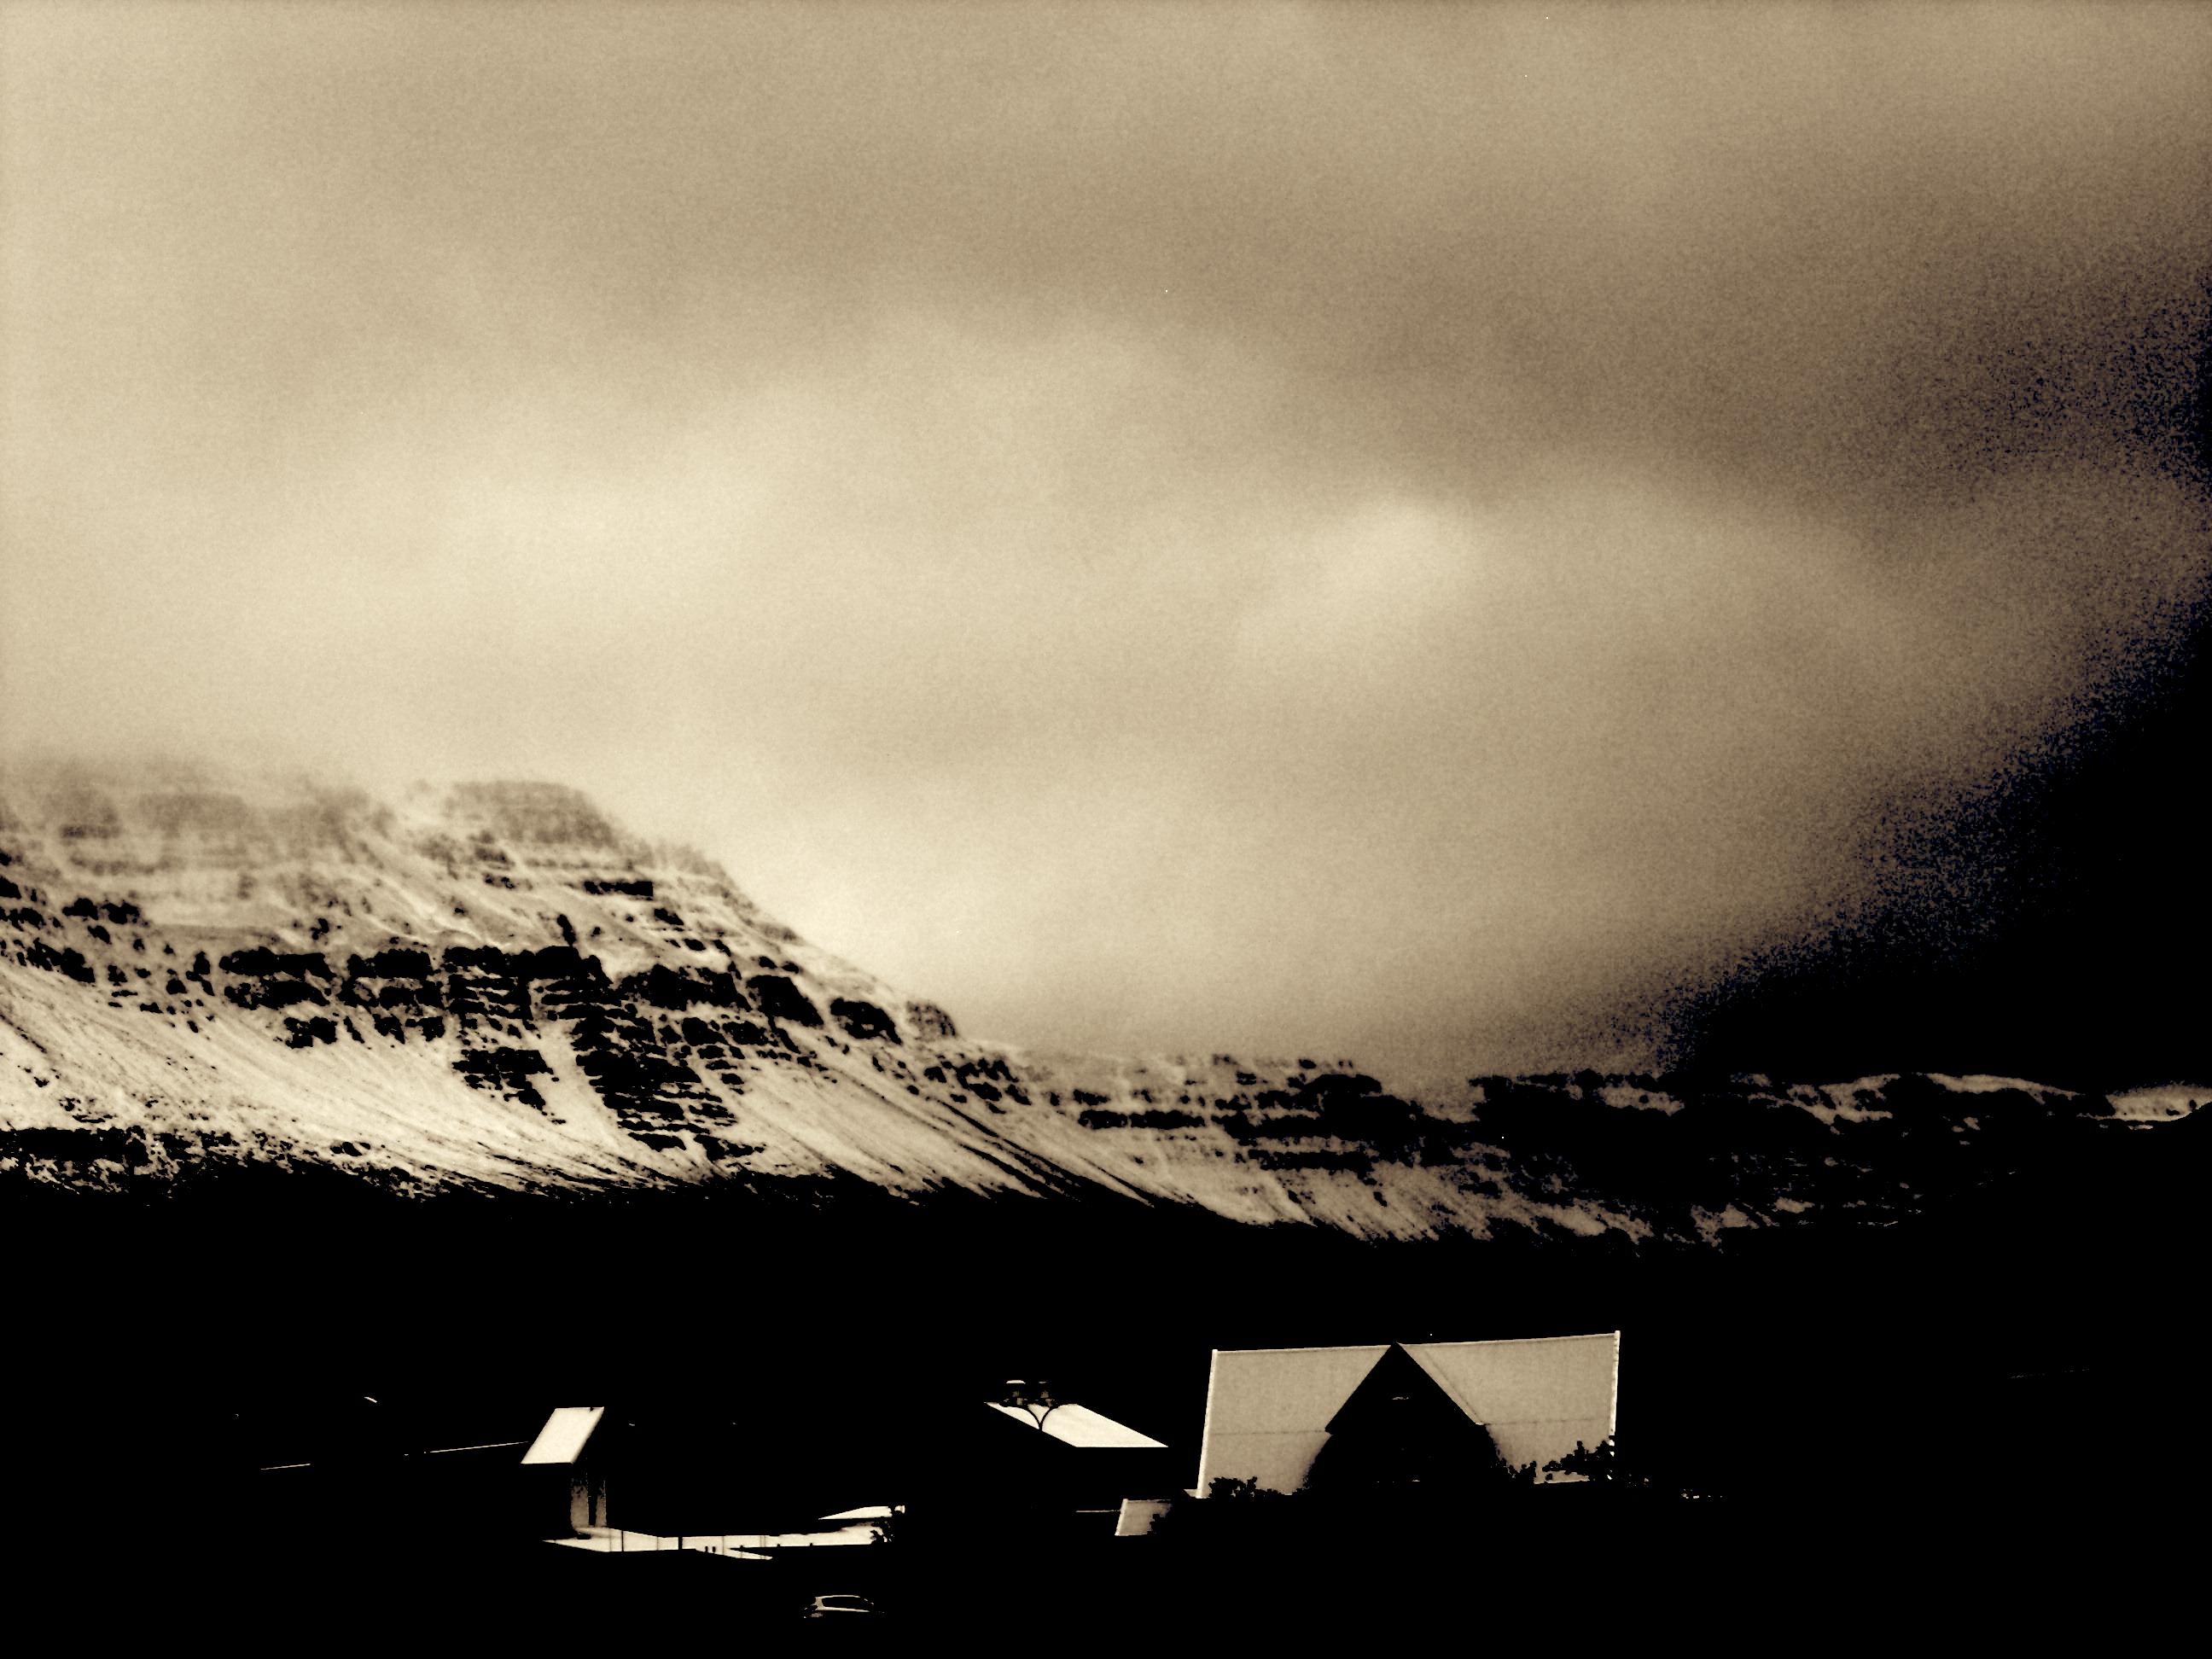 Friz_Seydisfjördur_town+mountain